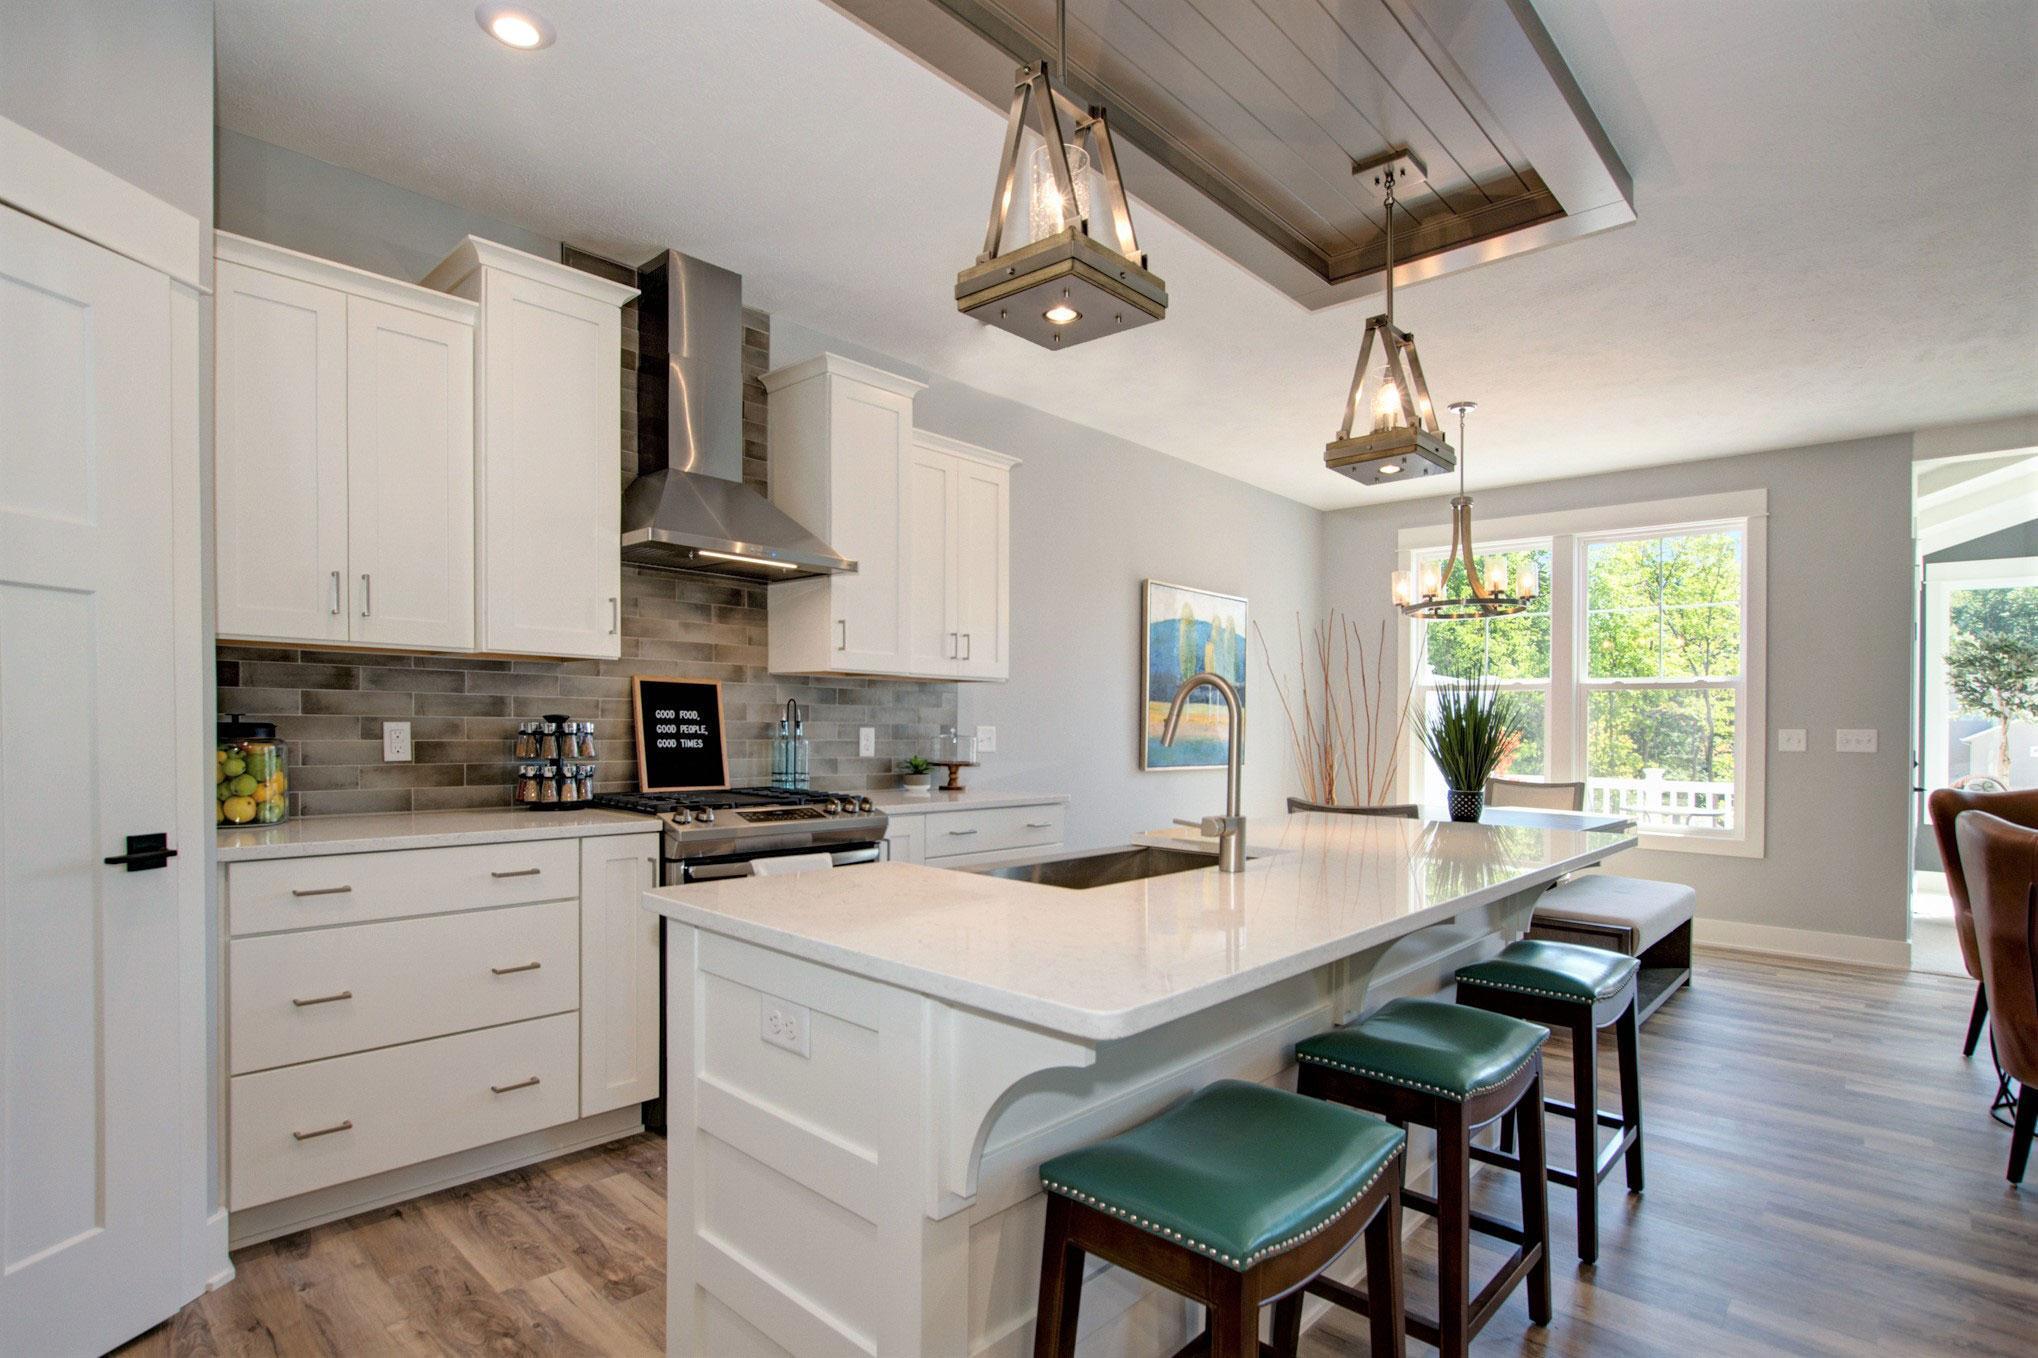 'Trillium Ridge' by Eastbrook Homes Inc. in Grand Rapids